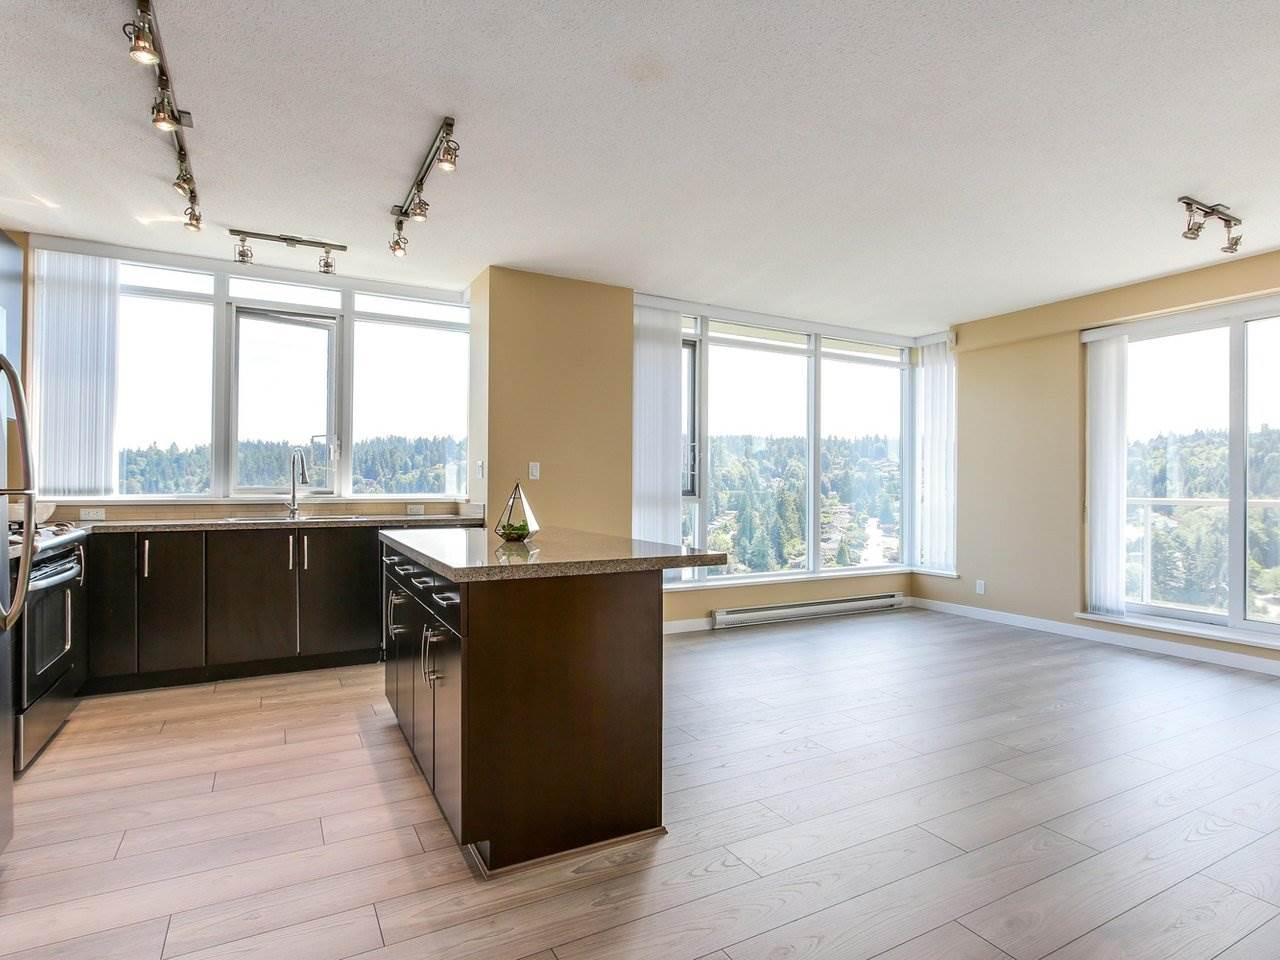 Condo Apartment at 3001 660 NOOTKA WAY, Unit 3001, Port Moody, British Columbia. Image 2